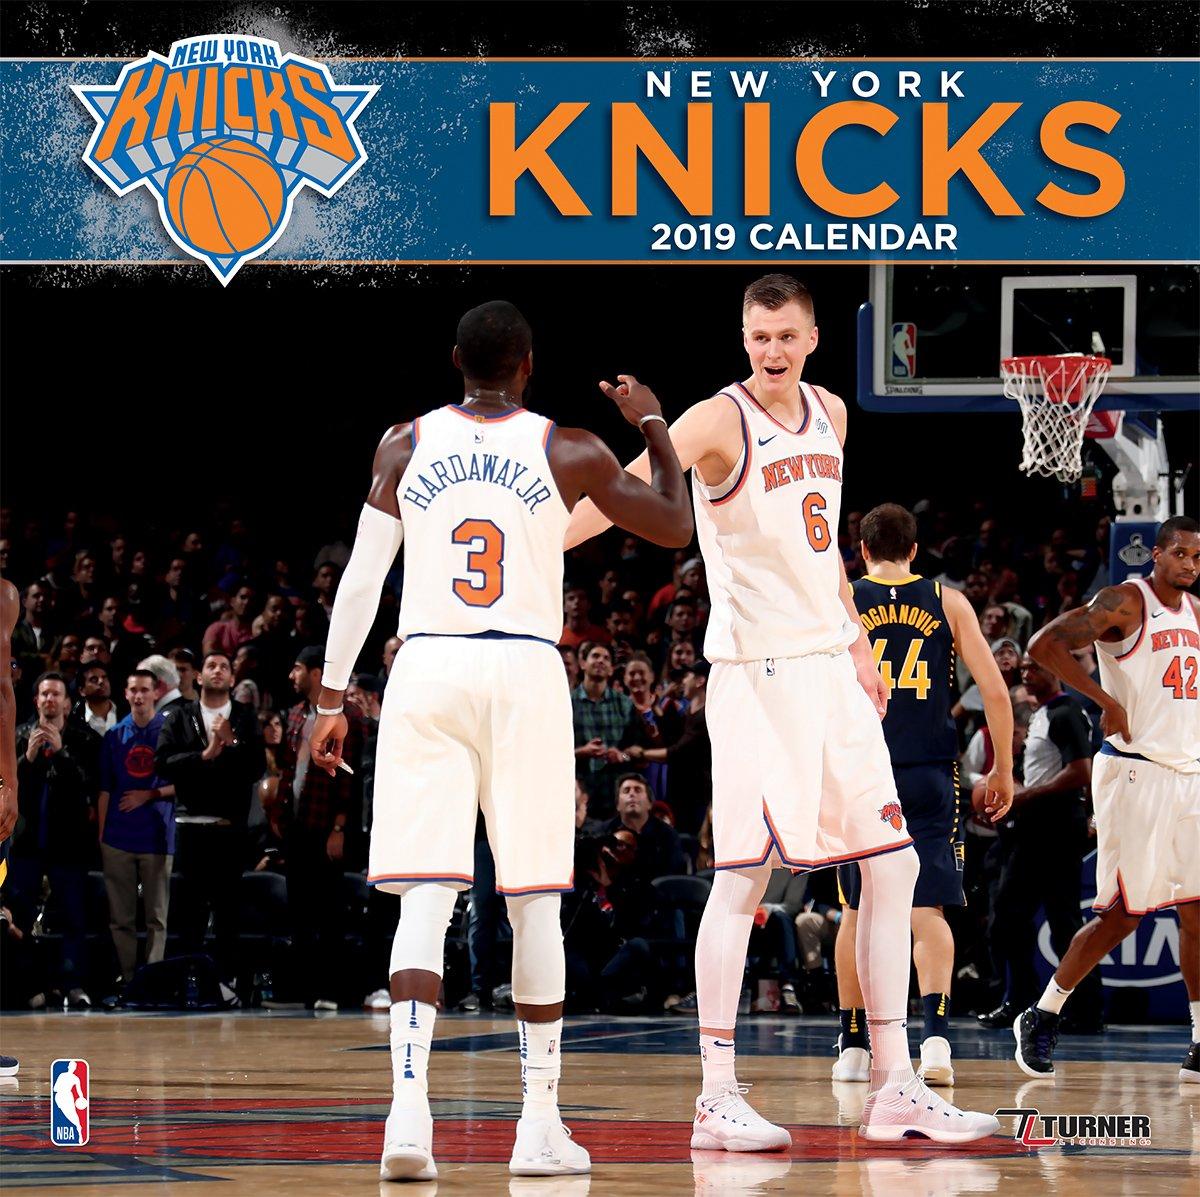 Knicks Calendar 2019 Amazon.com: Turner 1 Sport New York Knicks 2019 12X12 Team Wall